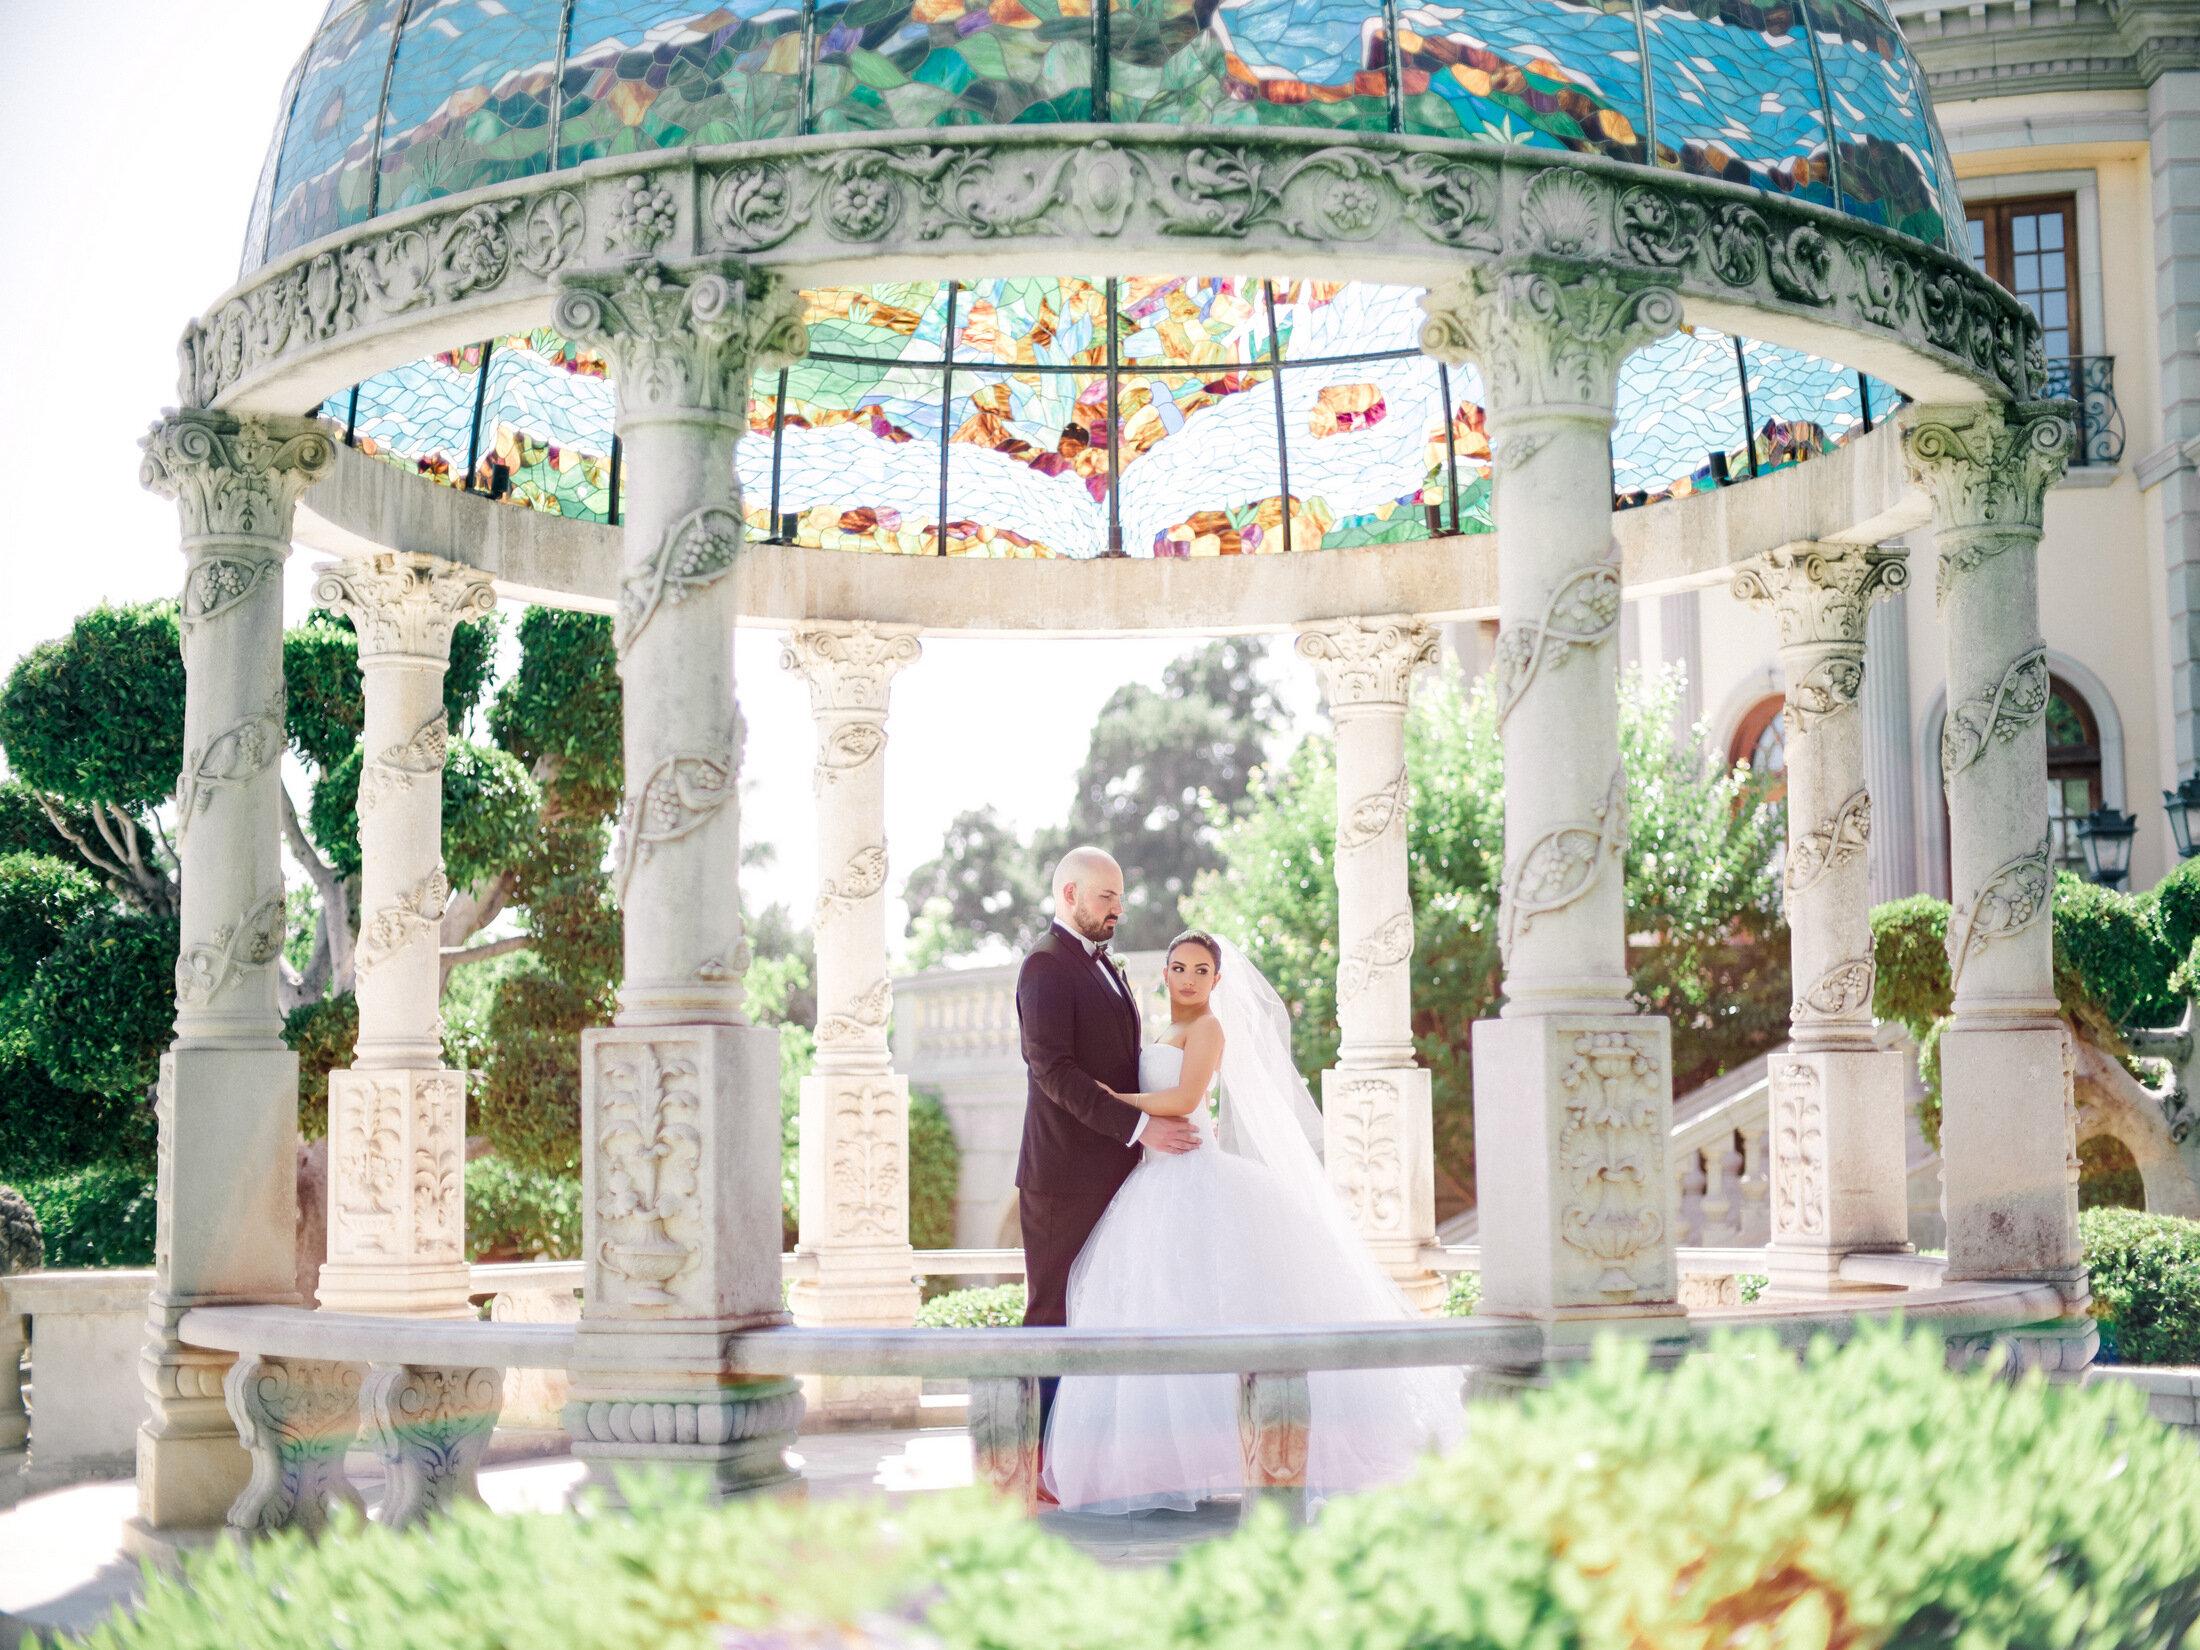 los angles luxury wedding vera wang bride in bridal gown wedding reception goals